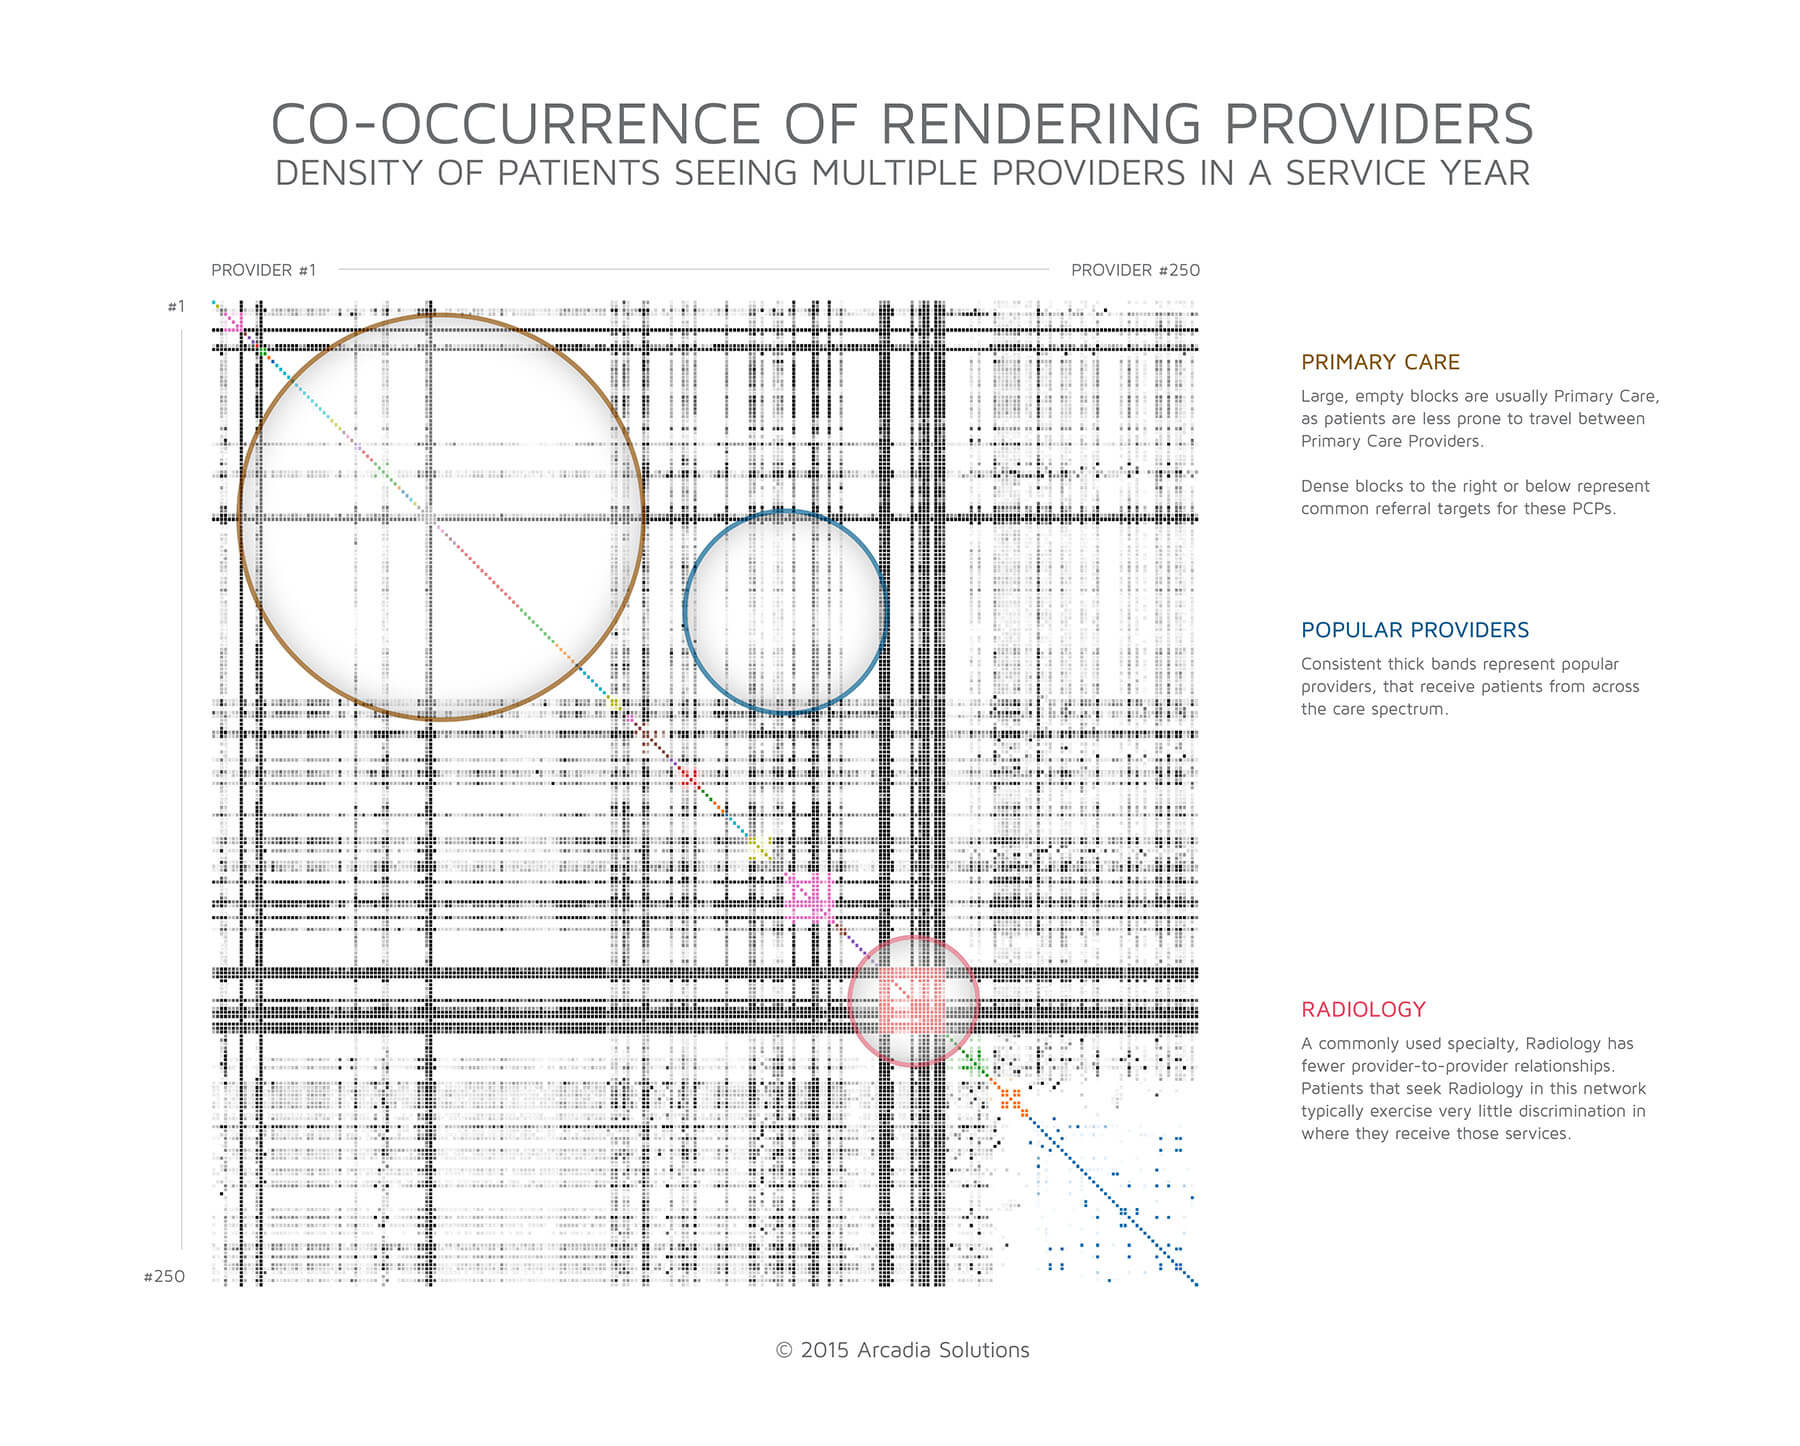 provCooccurrence.jpg